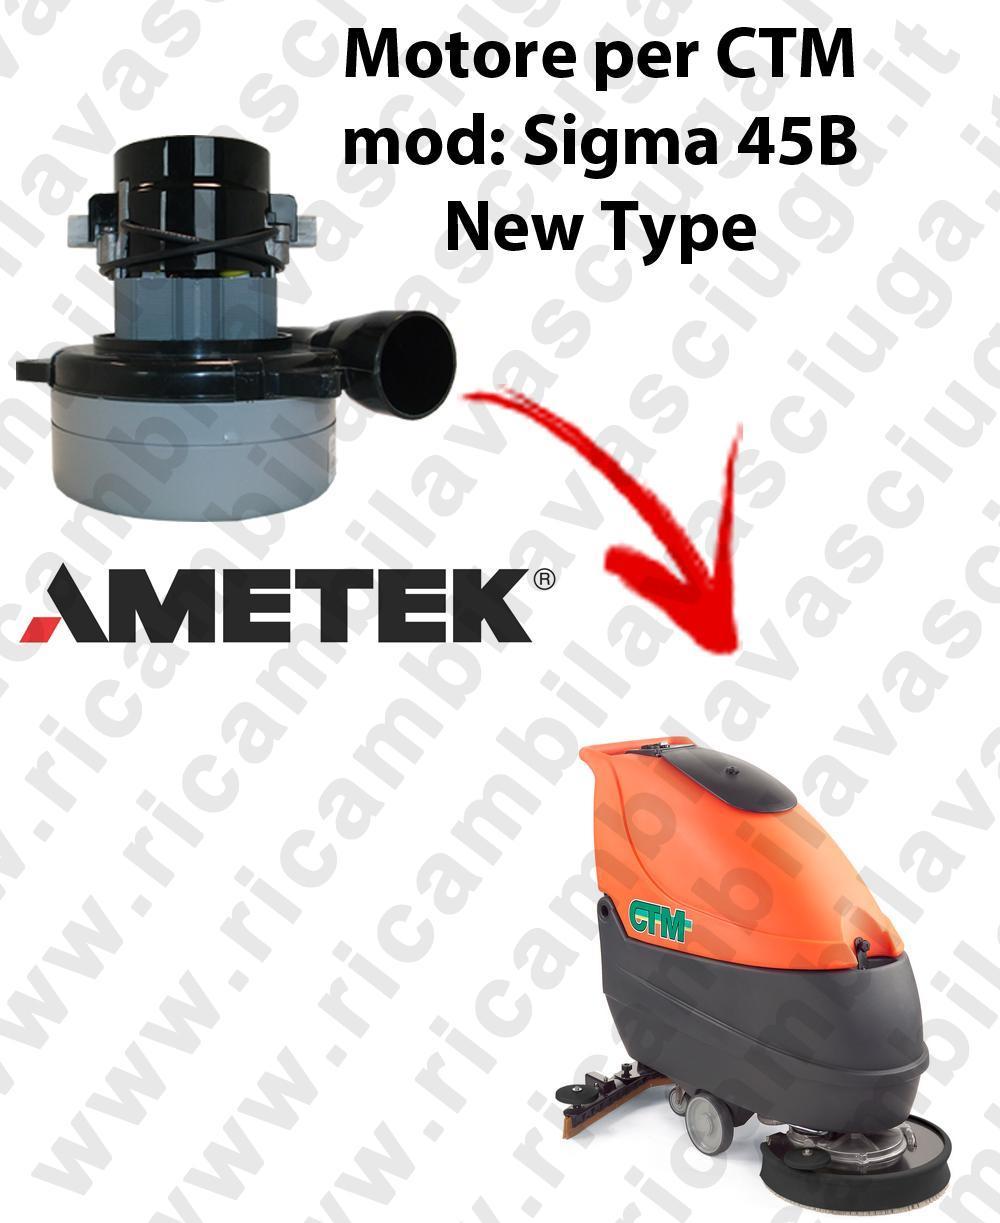 SIGMA 45B Motore de aspiración LAMB AMETEK para fregadora CTM